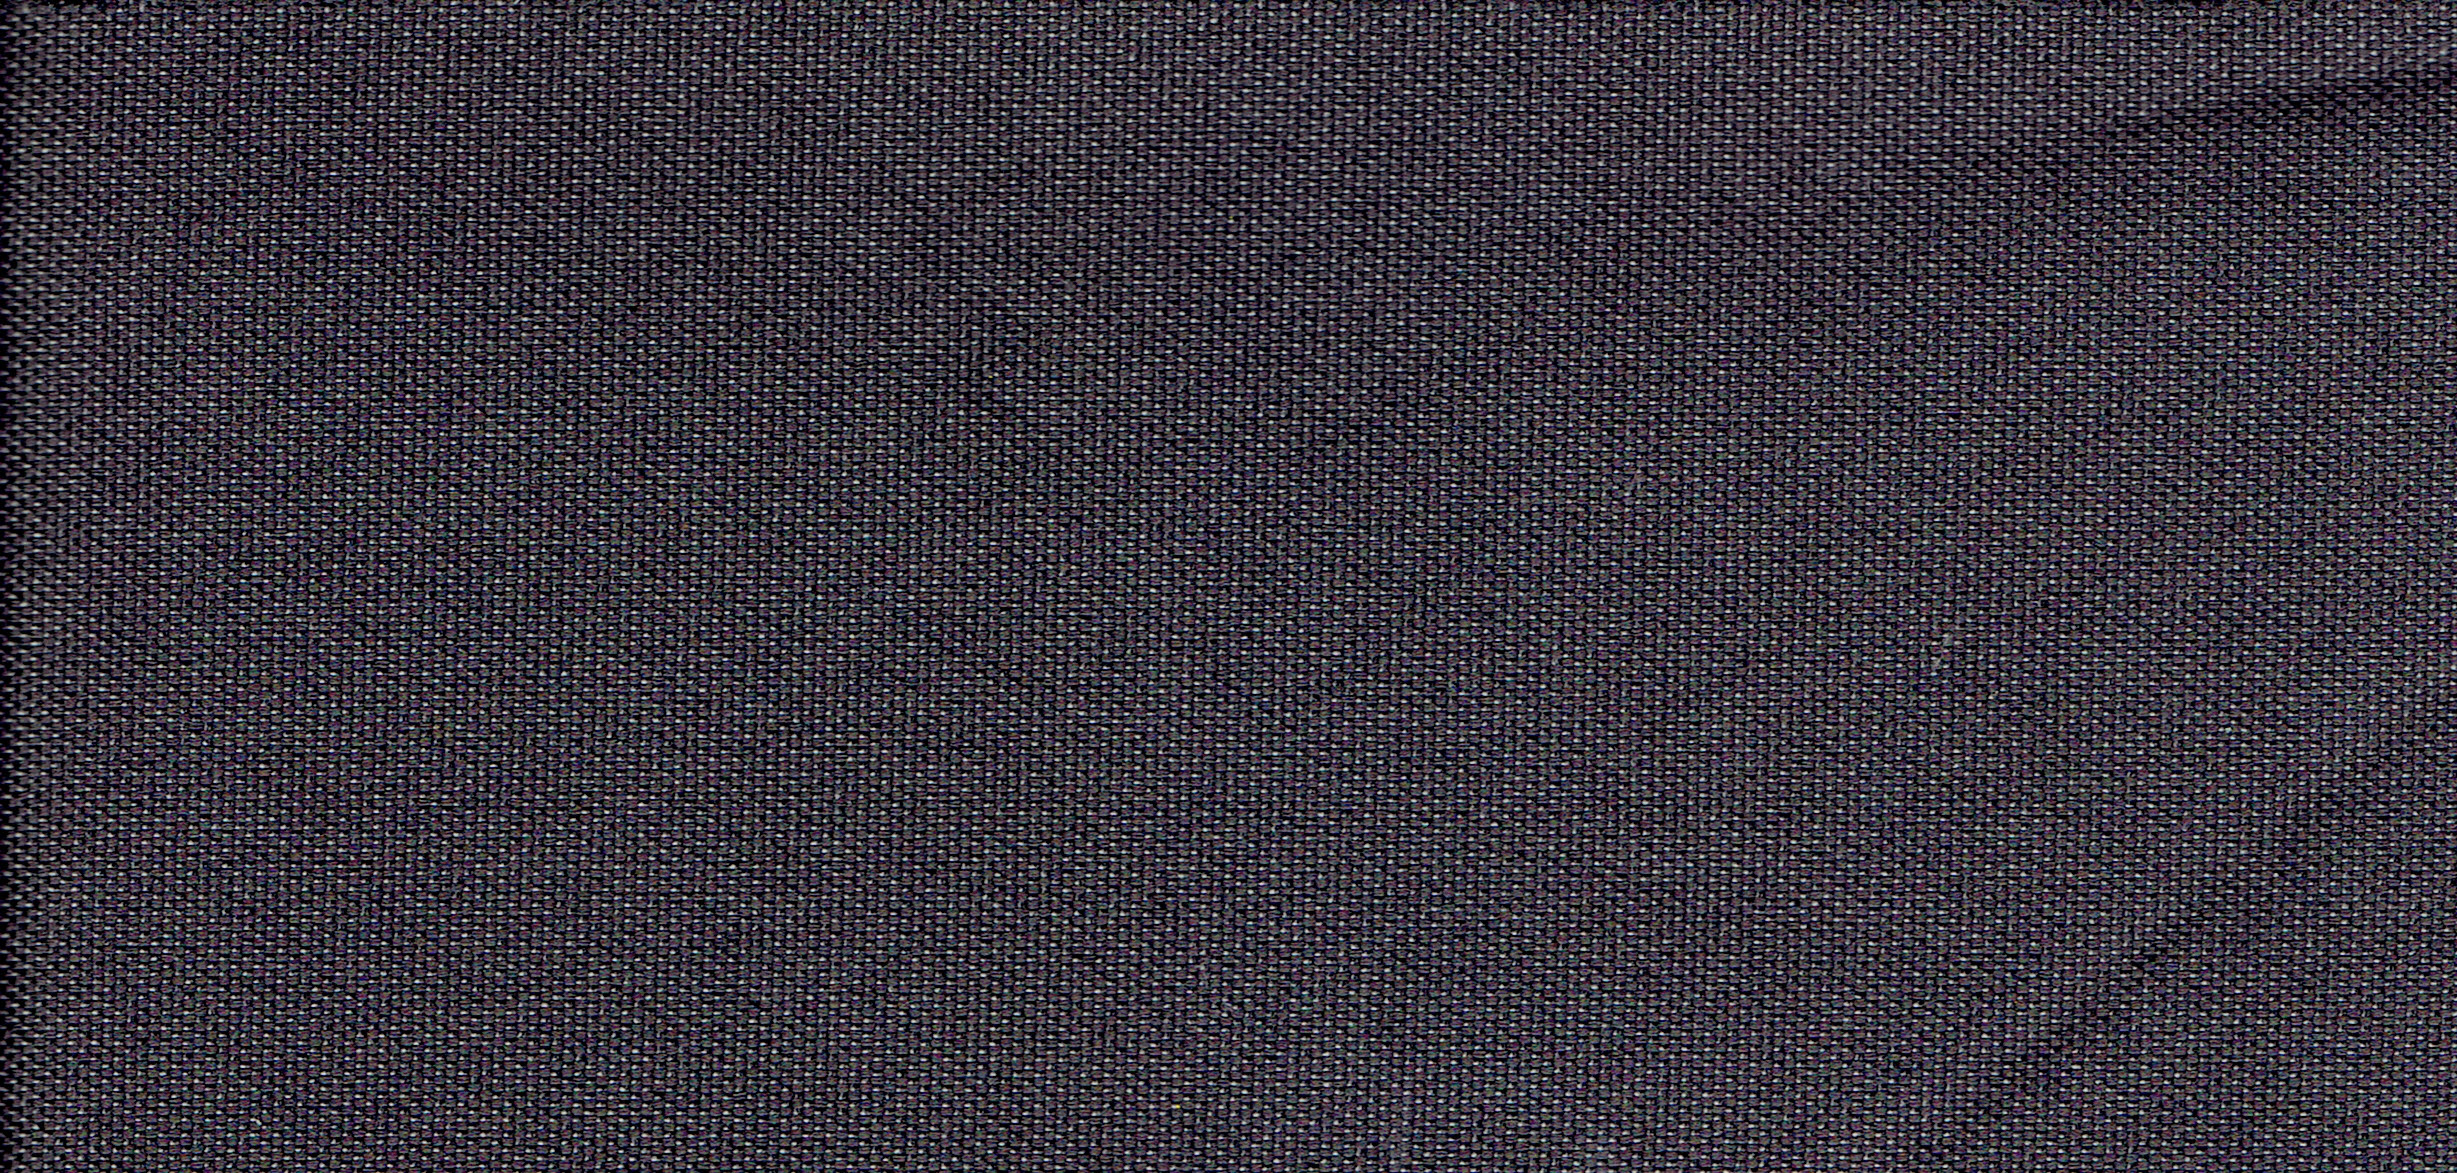 fabric26082015_0019.jpg